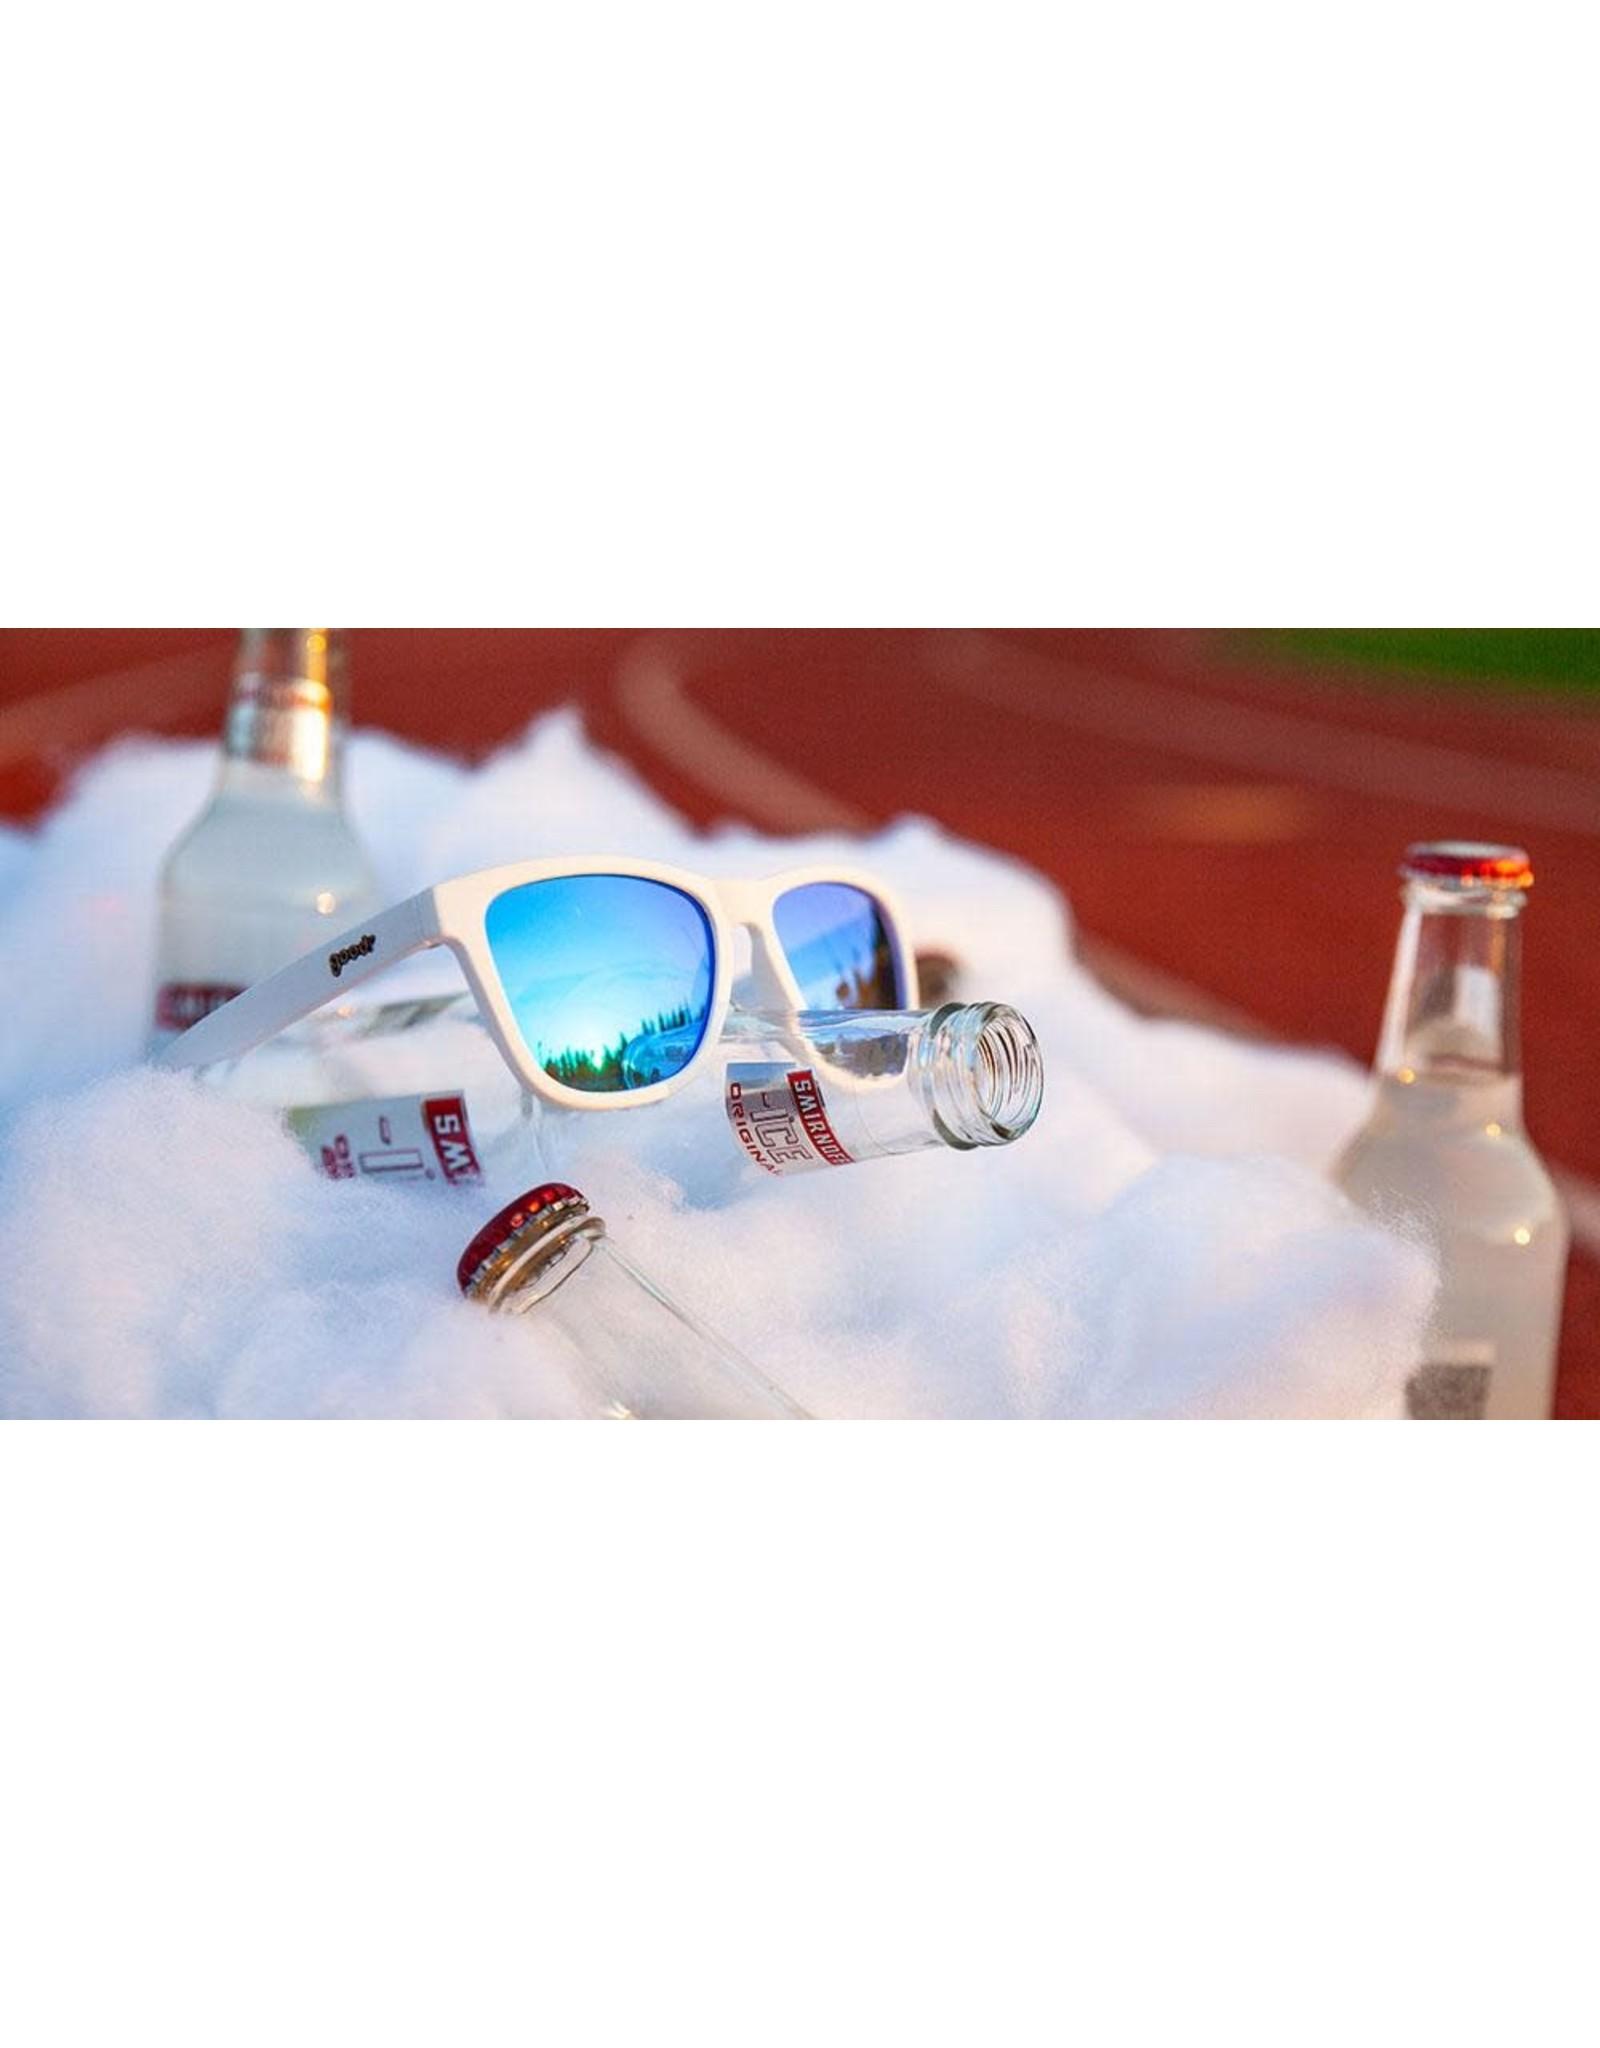 Goodr Goodr Iced by Yetis